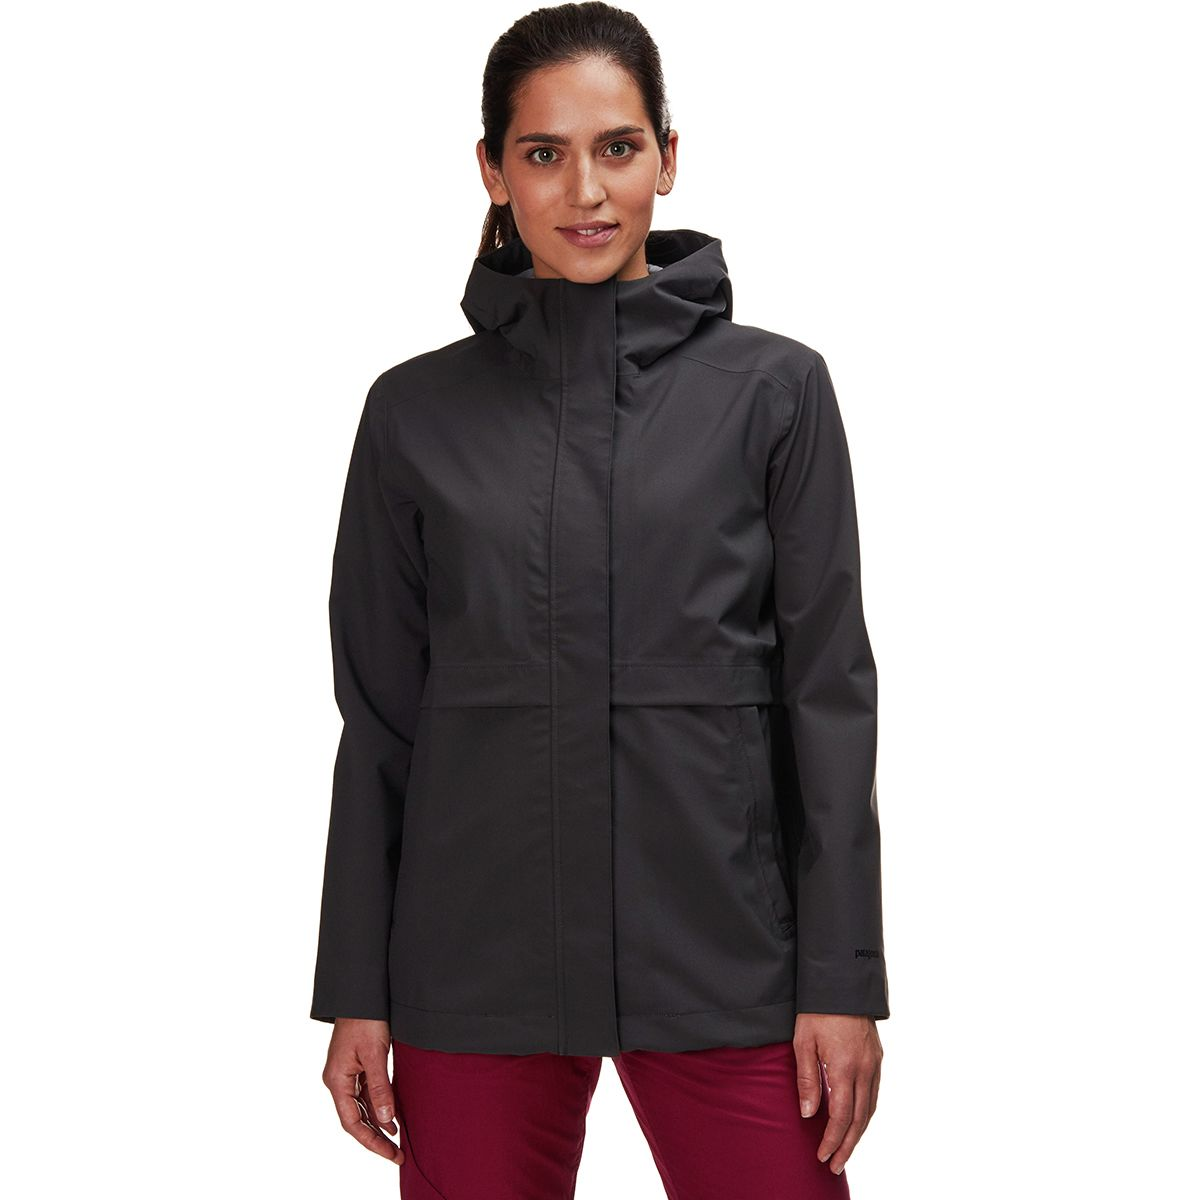 Patagonia Cloud Country Jacket